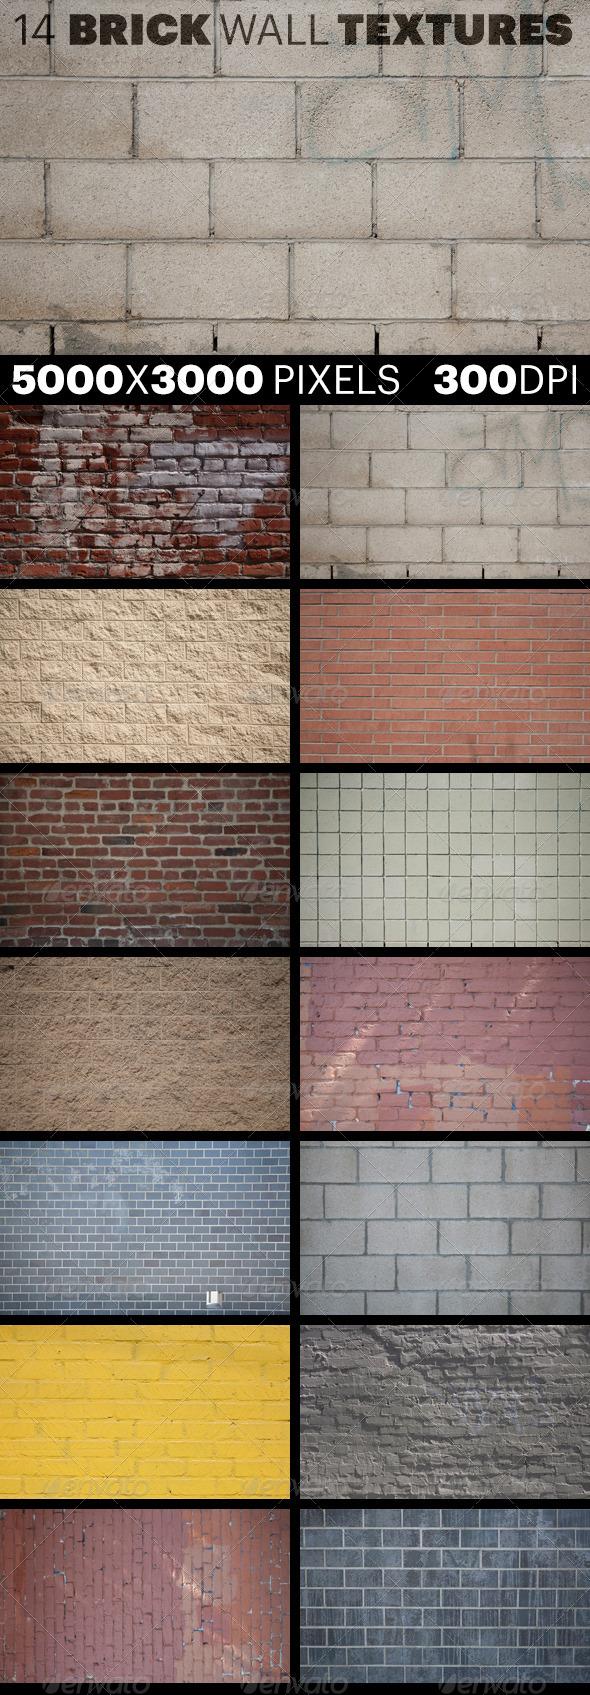 14 Brick Wall Textures